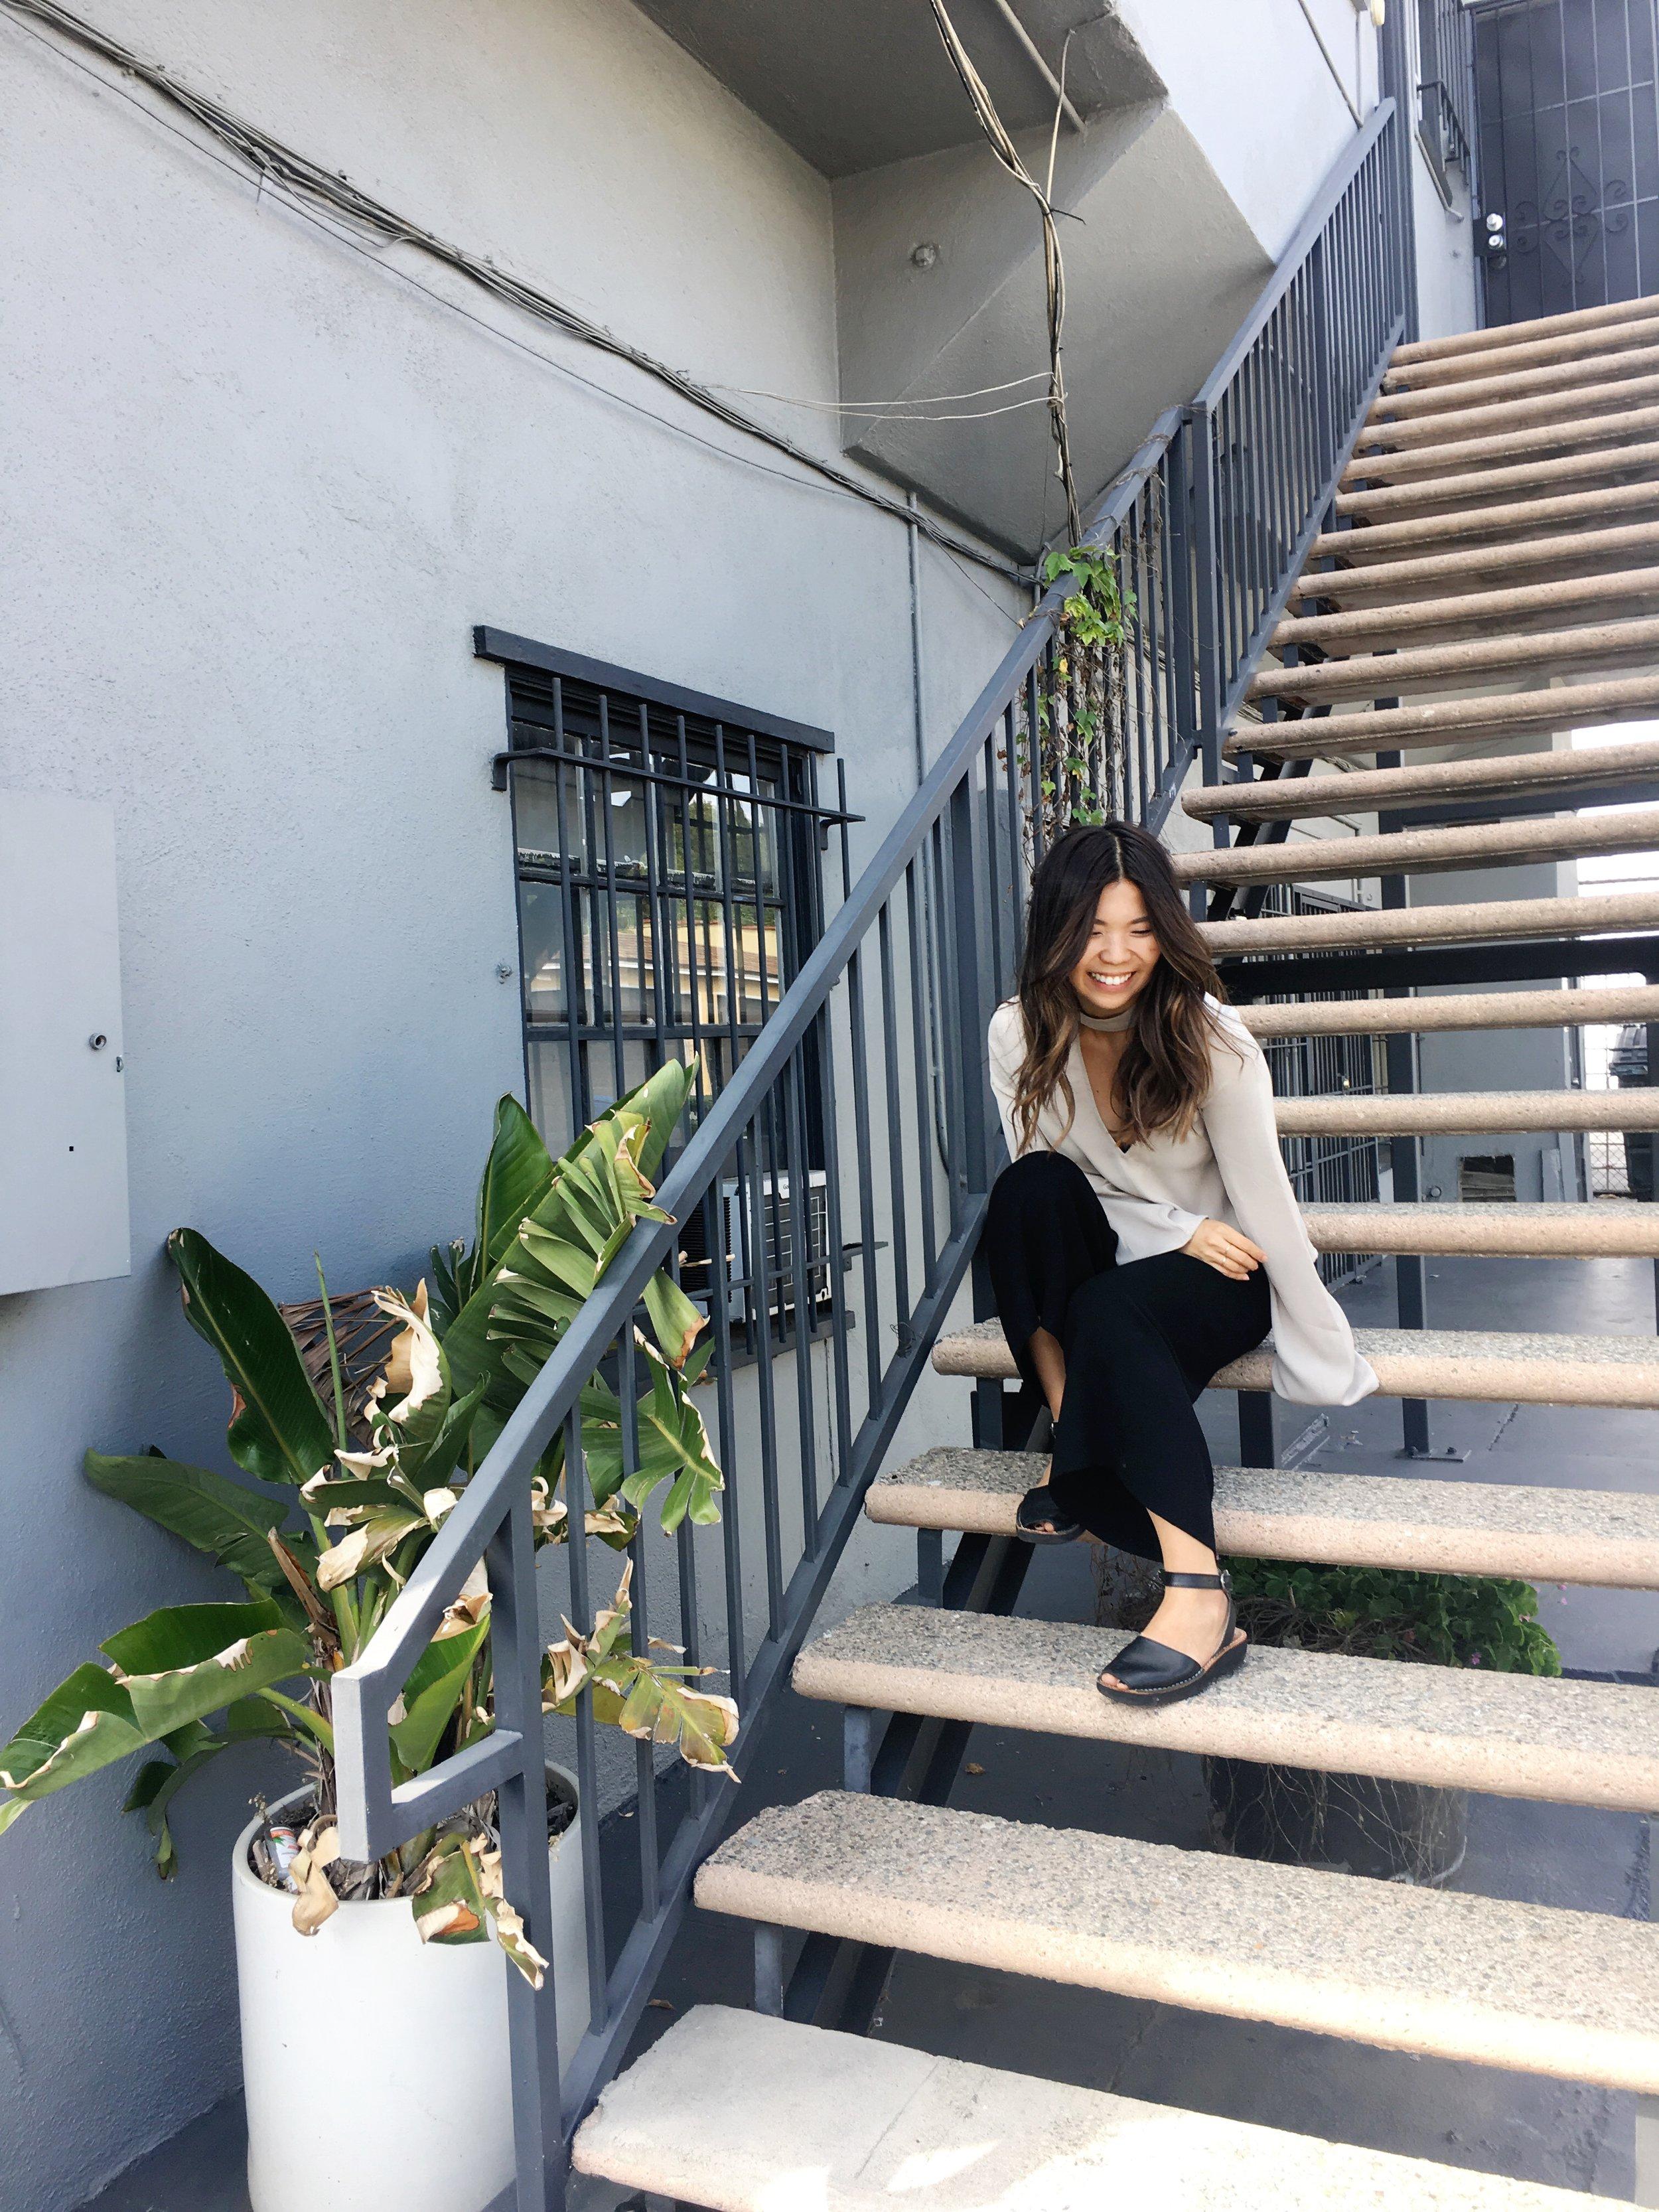 staircase photoshooot